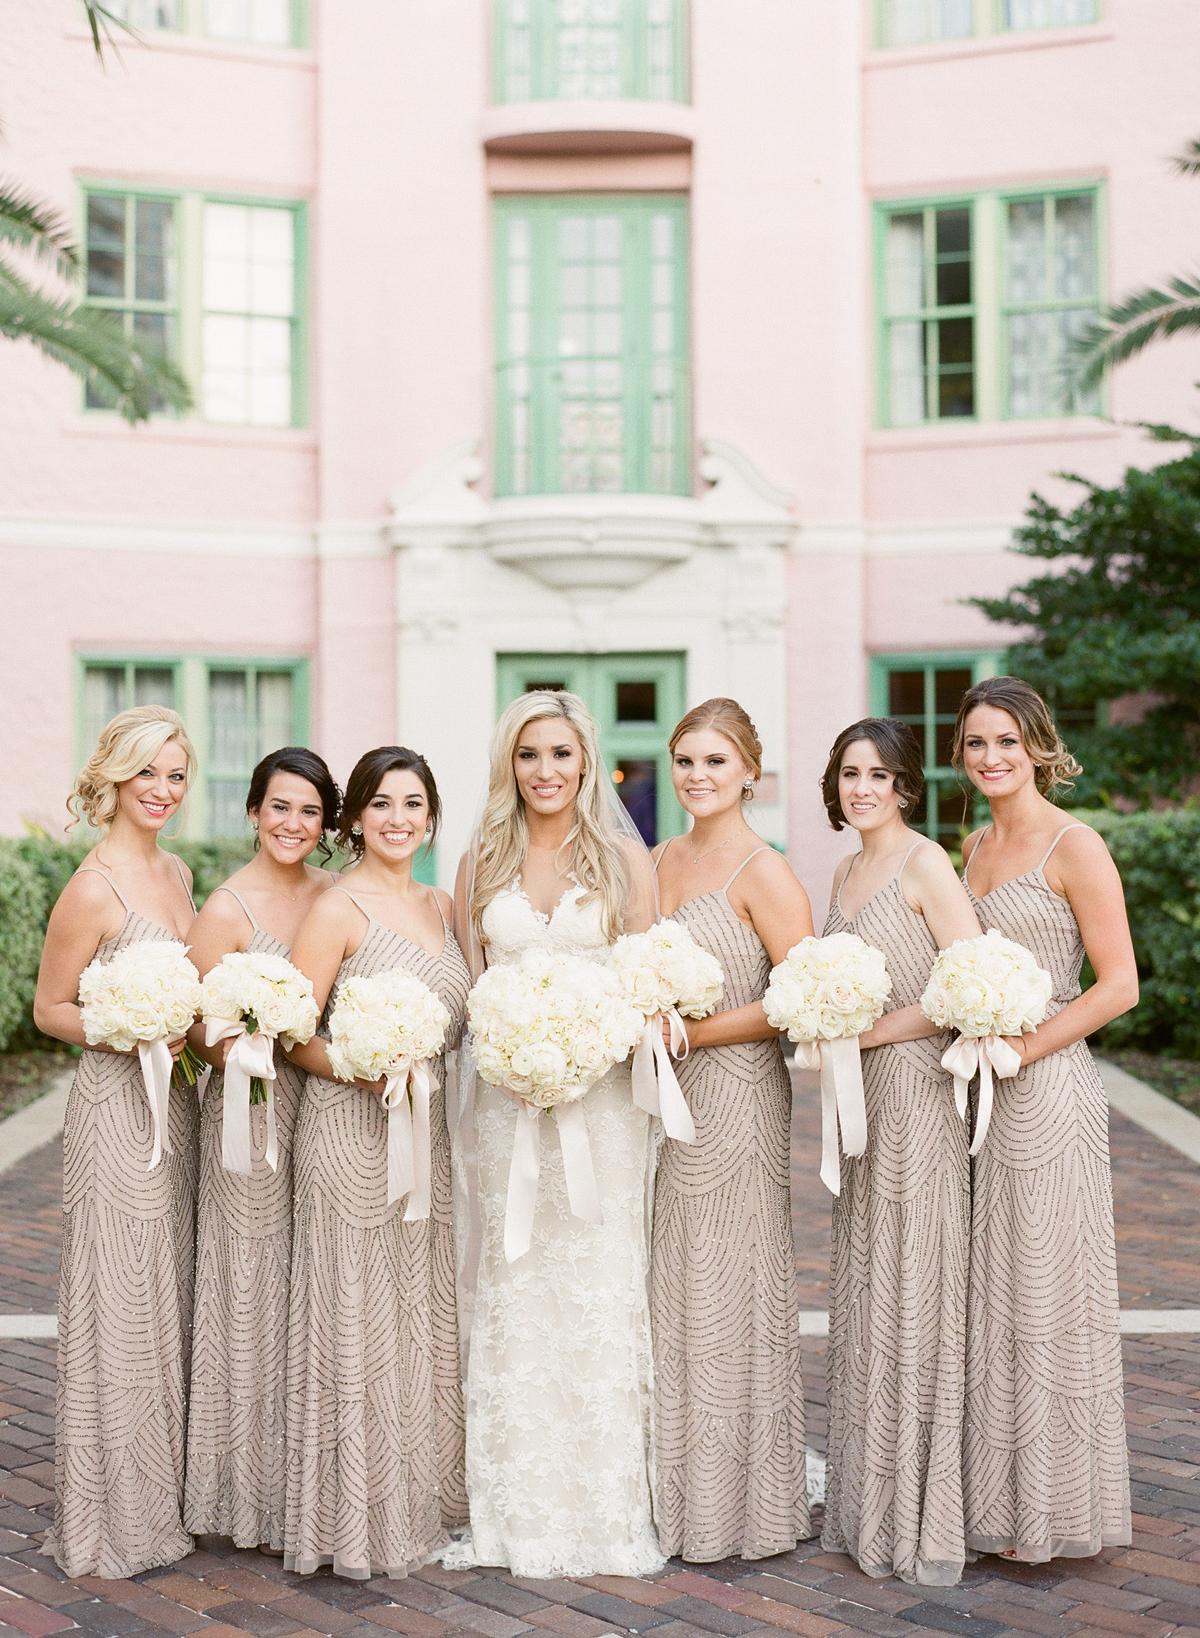 wedding bridesmaids dresses photo - 1